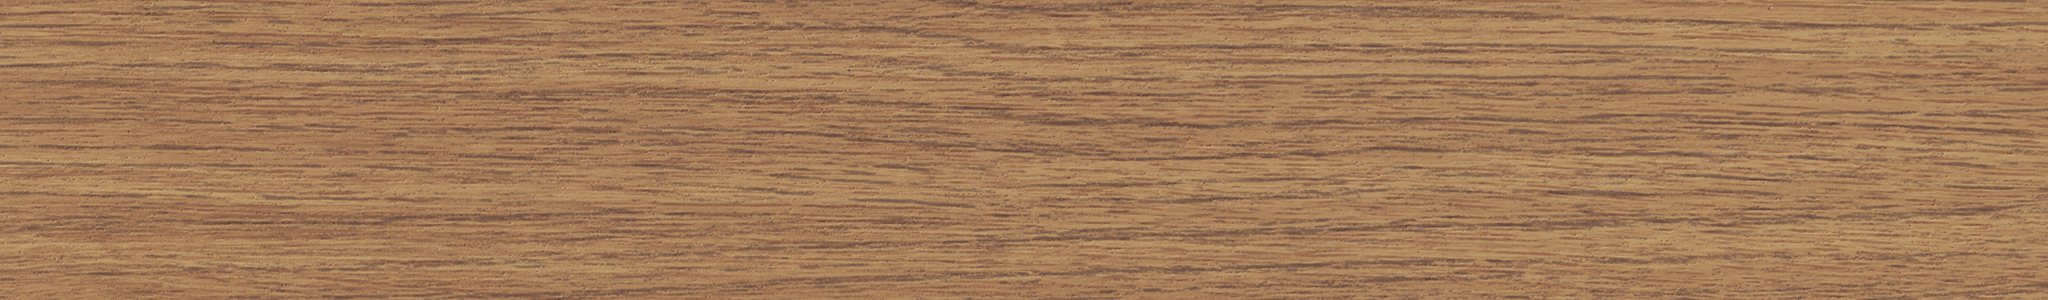 HD 242419 ABS hrana Antique dub gravír